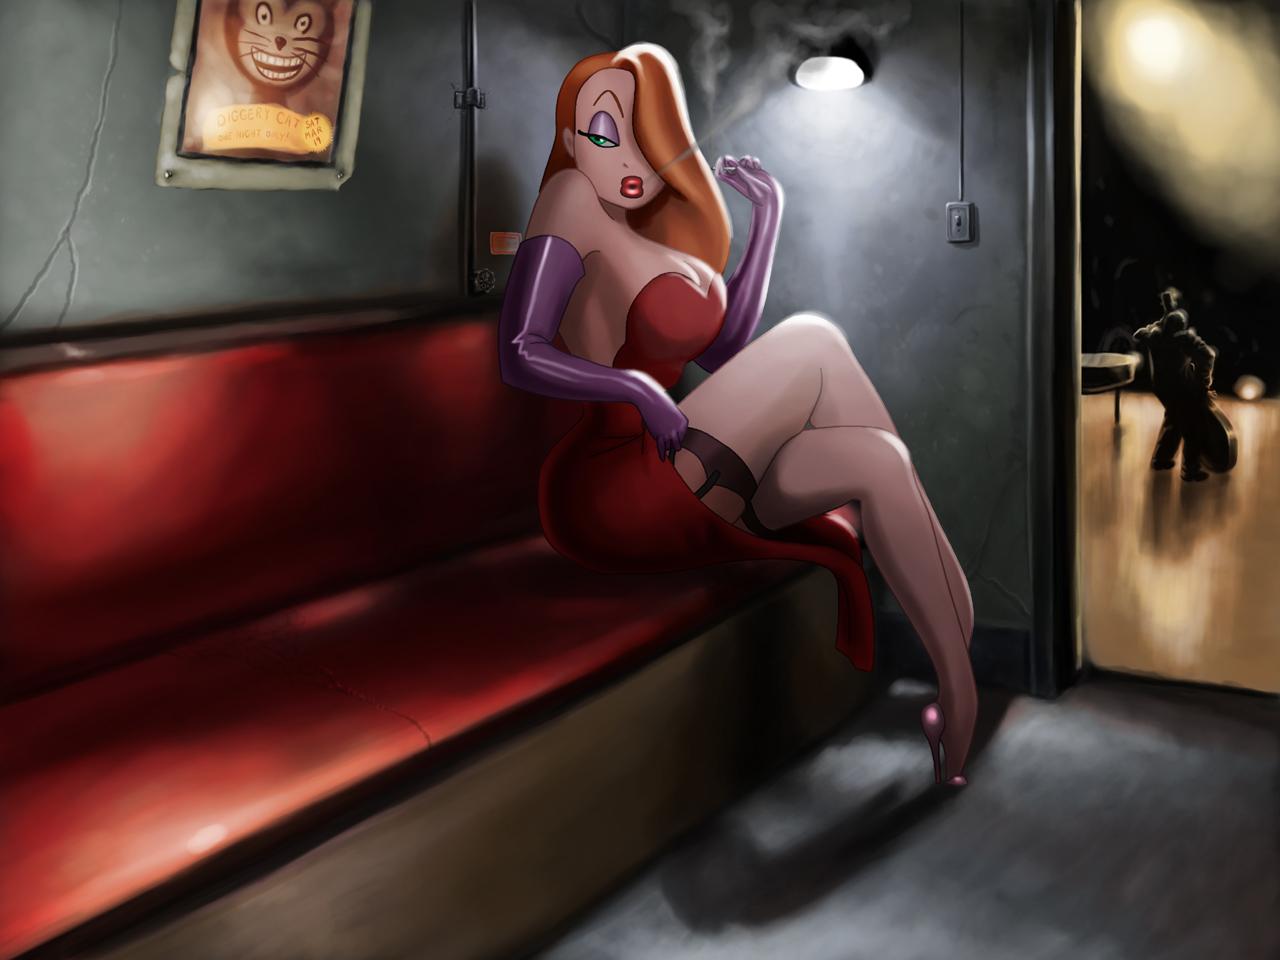 Jessica Rabbit Wallpaper By Tyramenendez On Deviantart